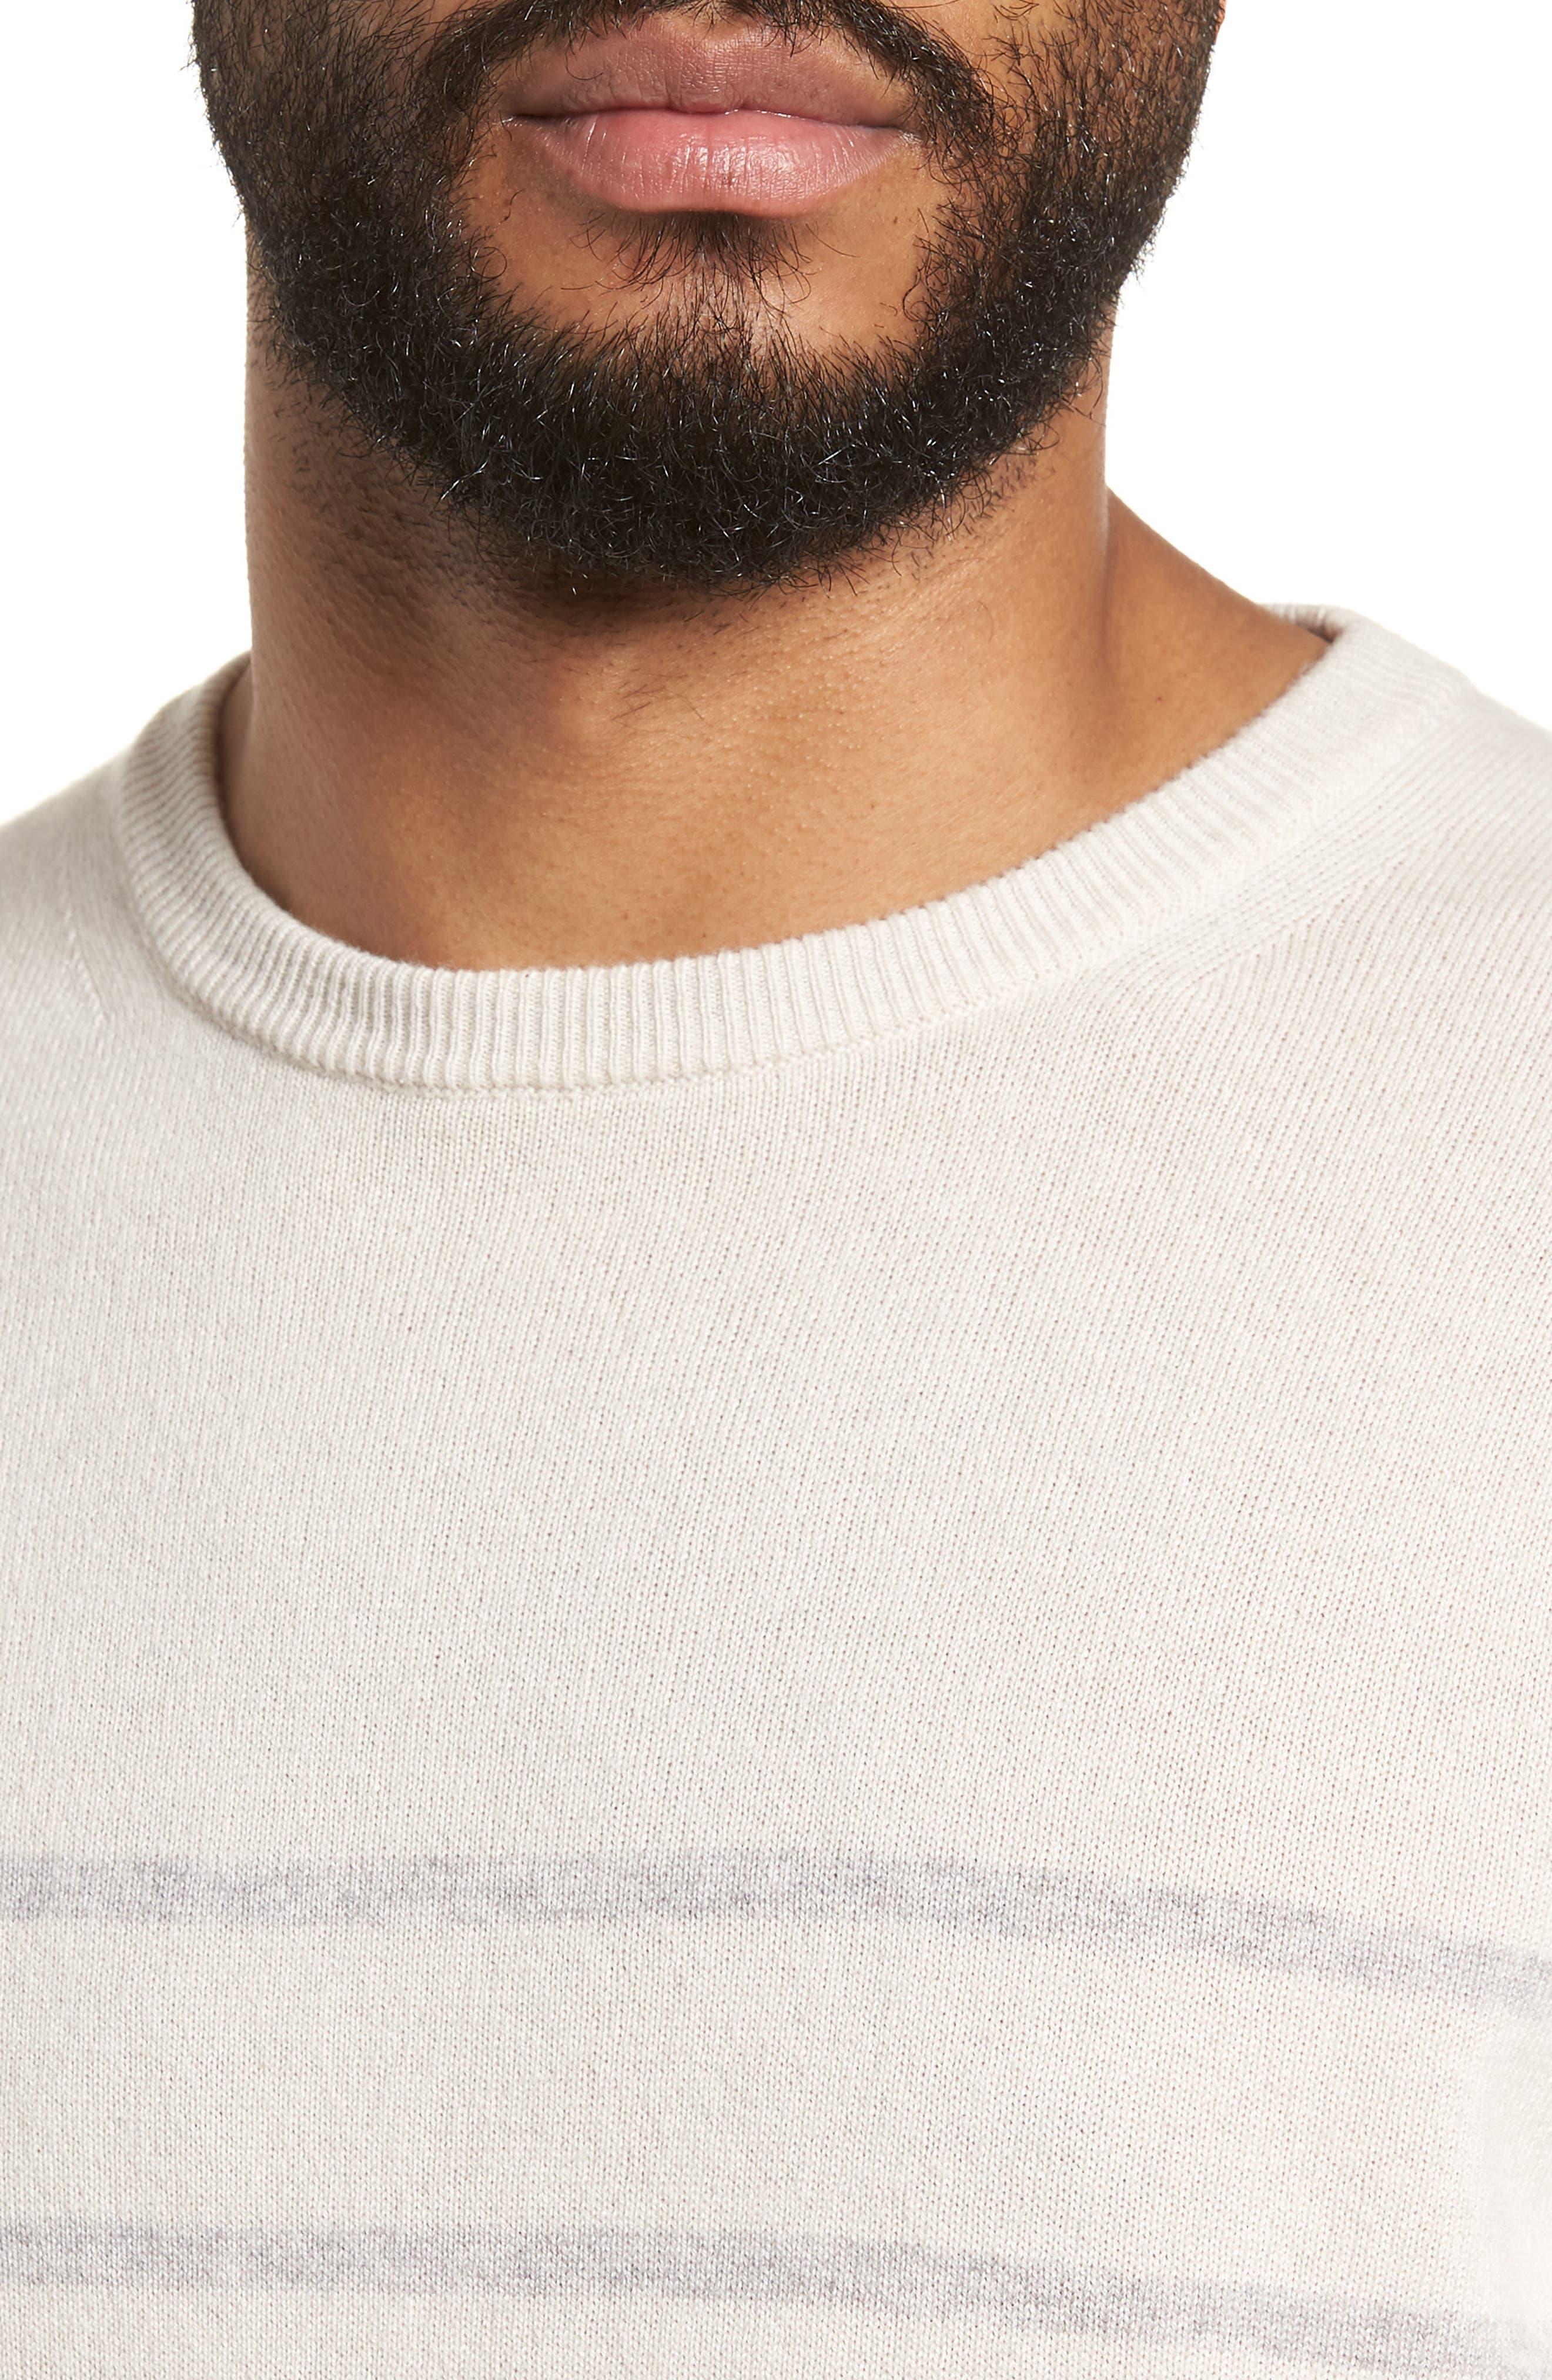 Cashmere Crewneck Sweater,                             Alternate thumbnail 4, color,                             Ivory